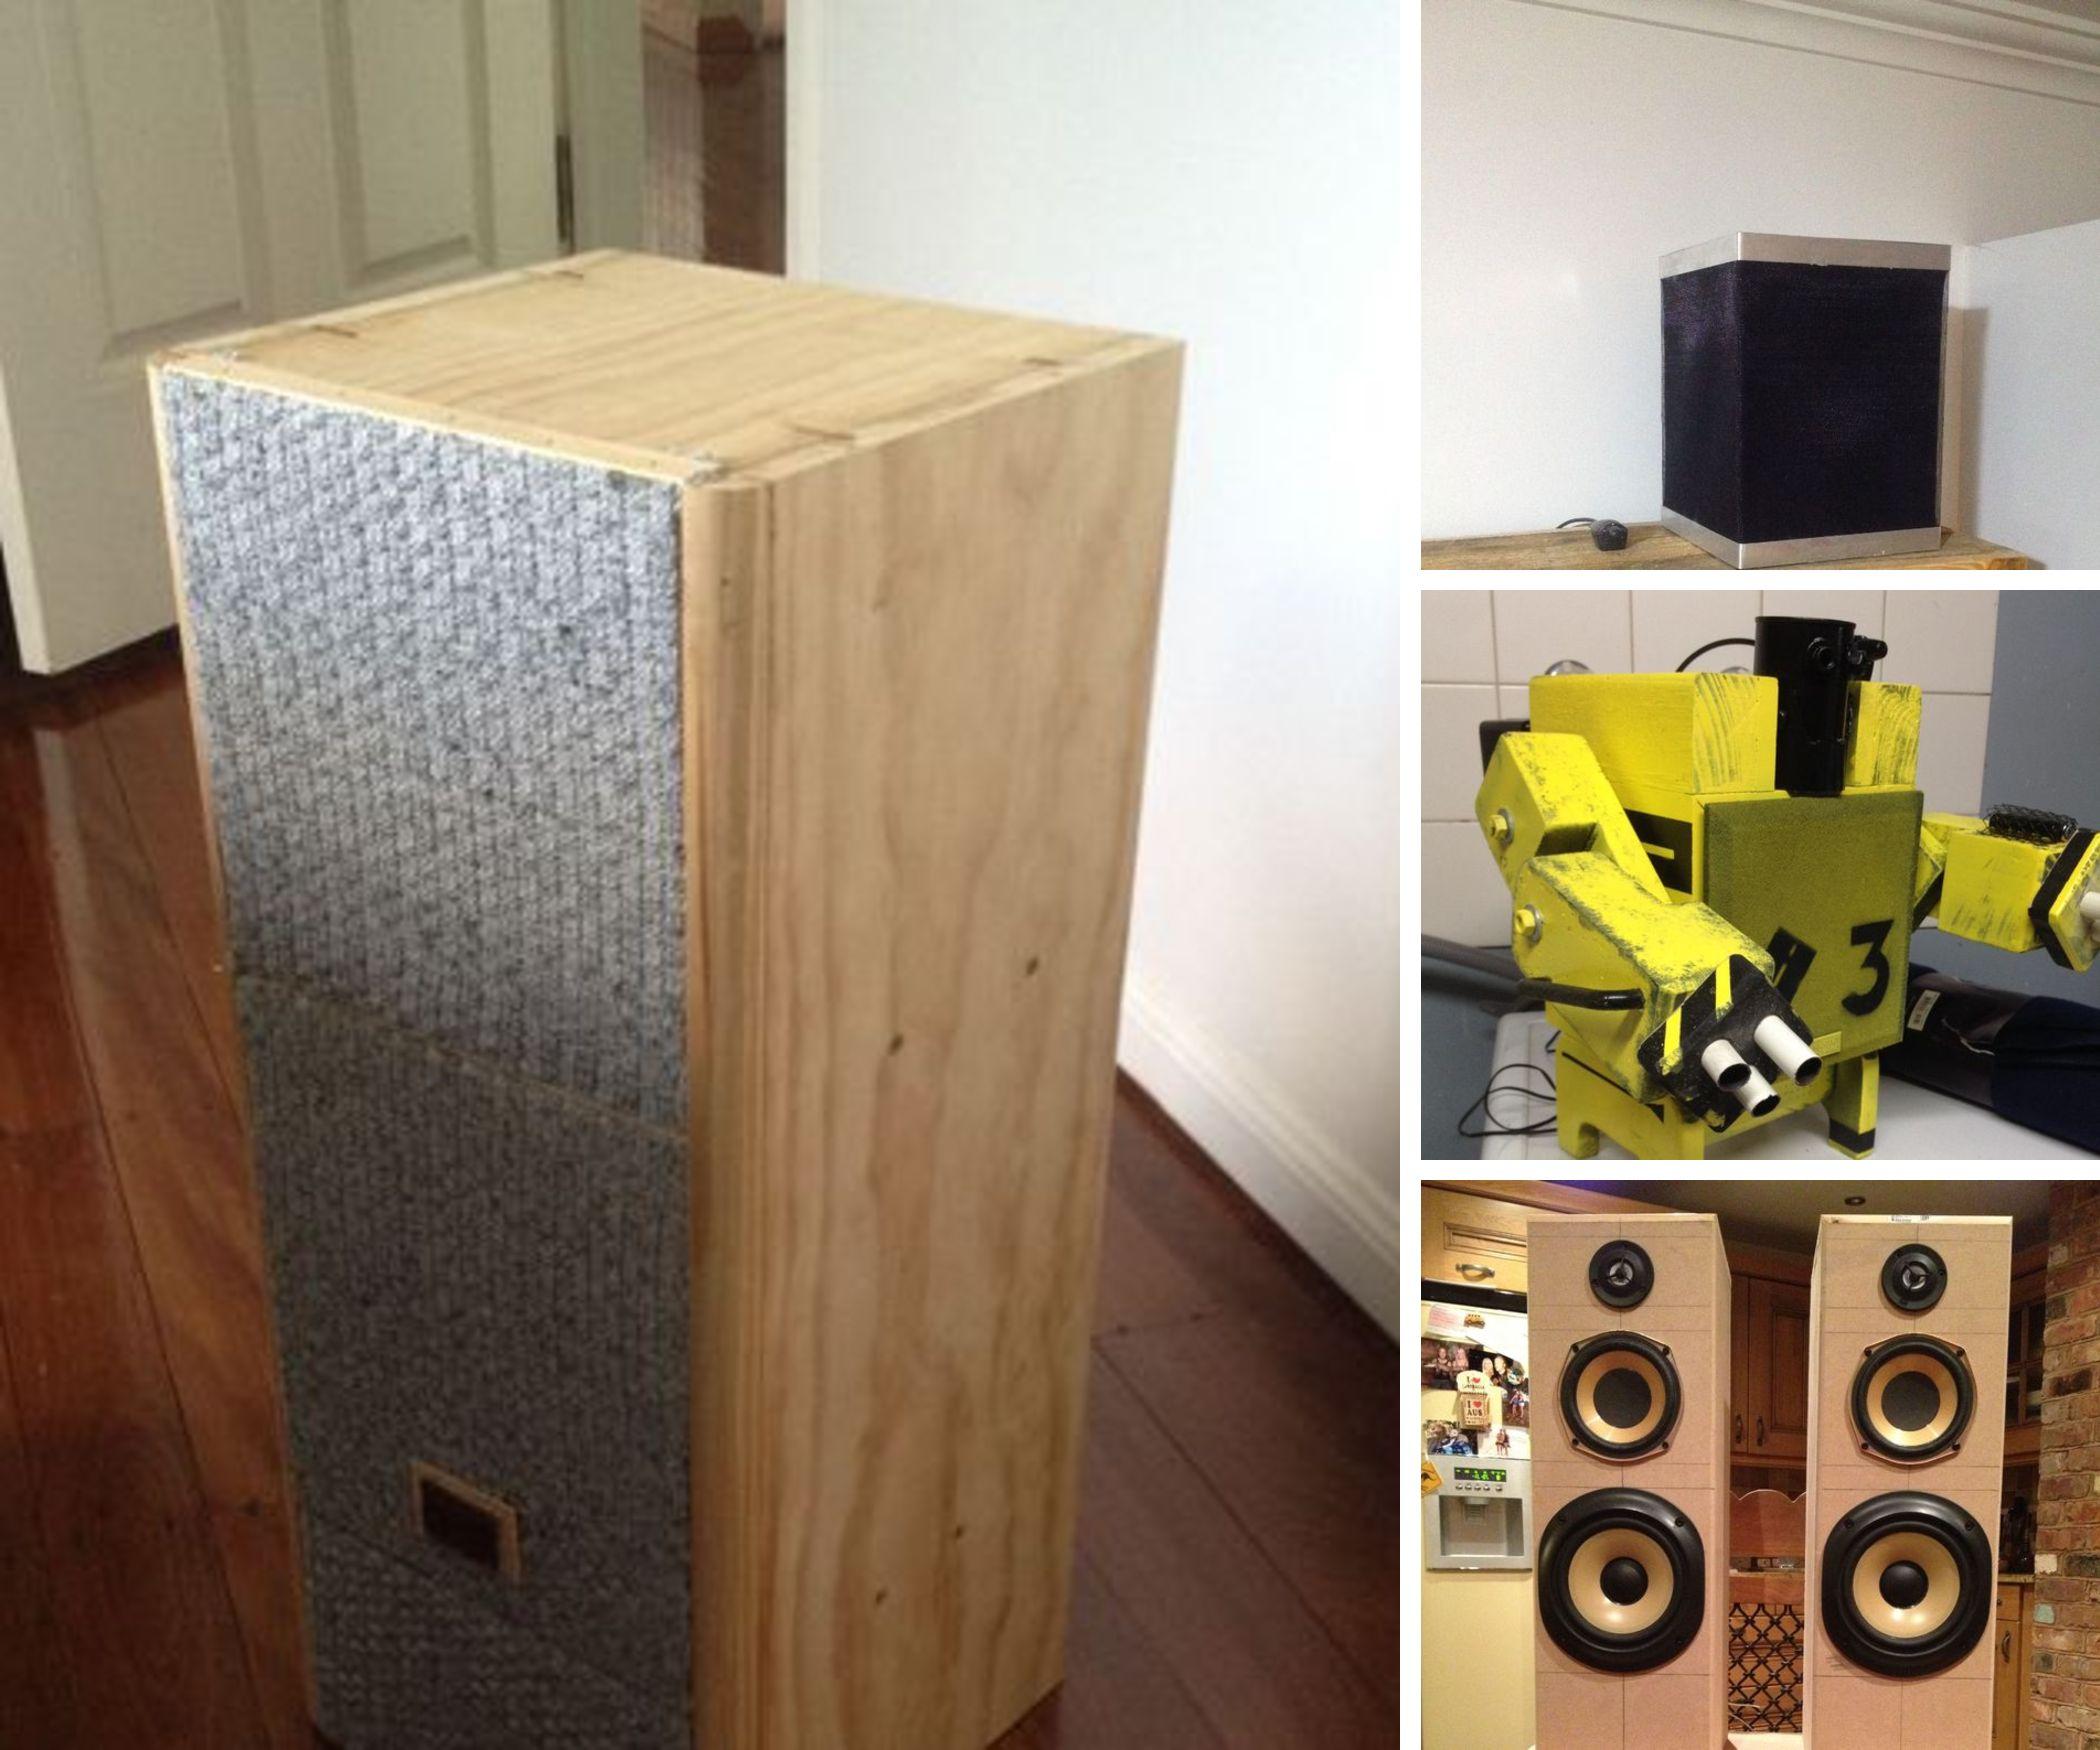 Multi-Room Wifi audio system full build